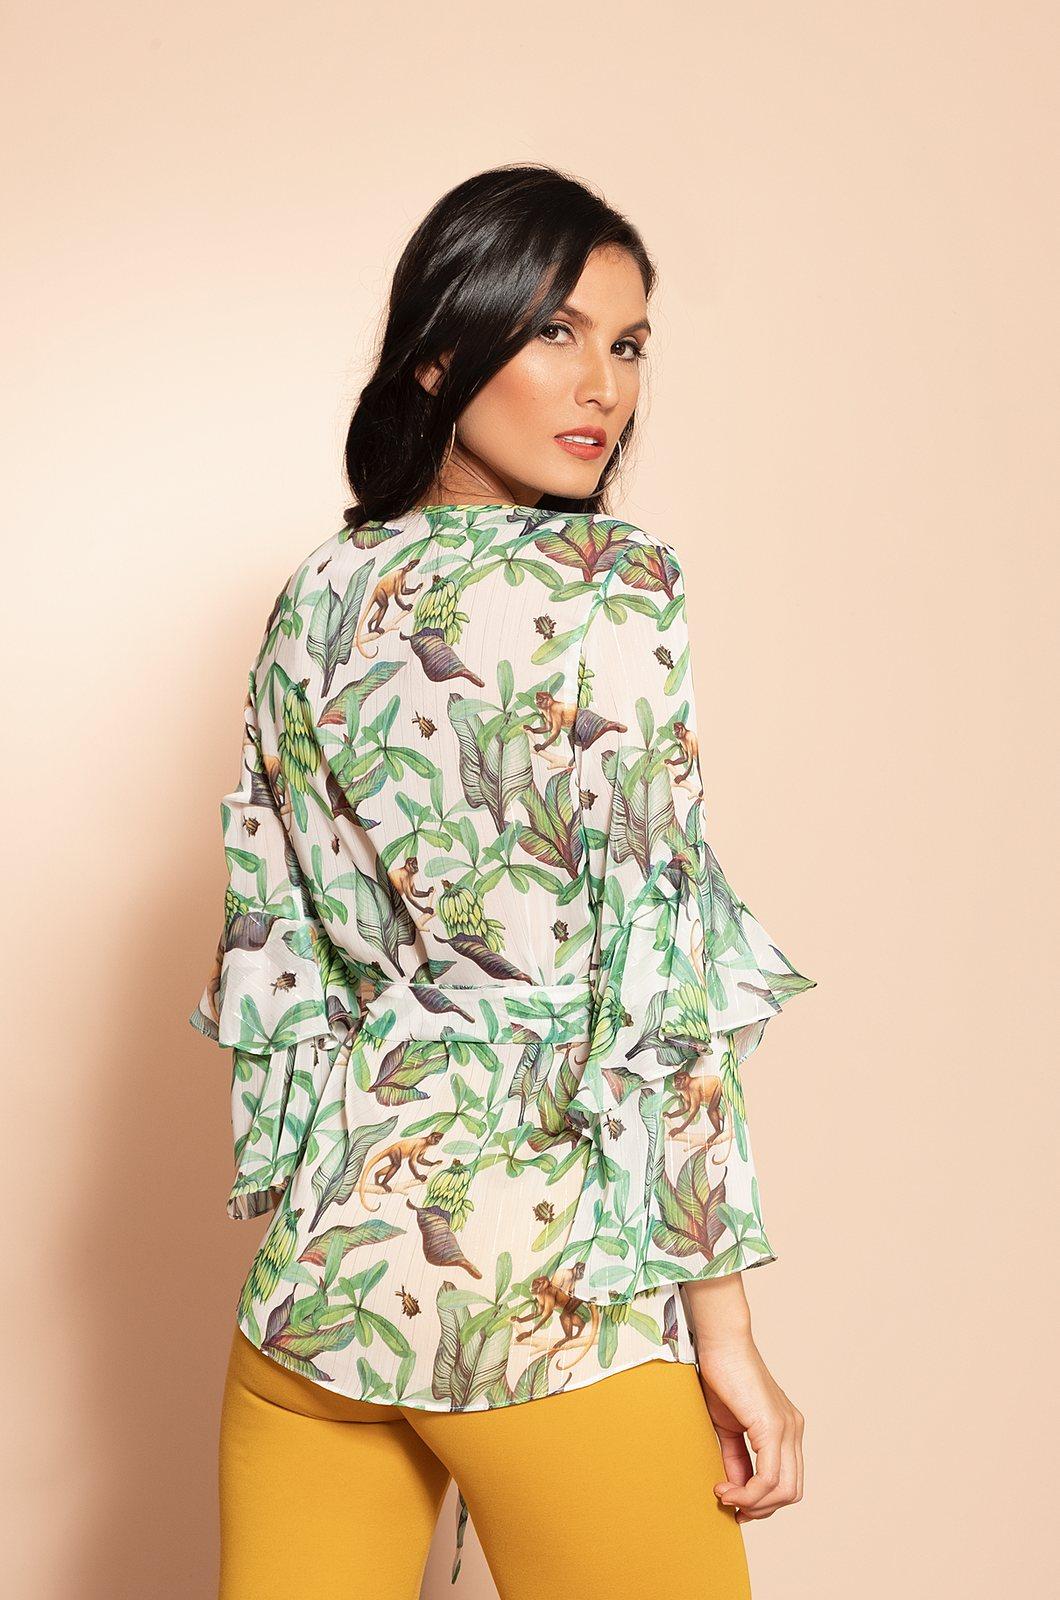 Blusa estampada tropical - Chazari 4993-20